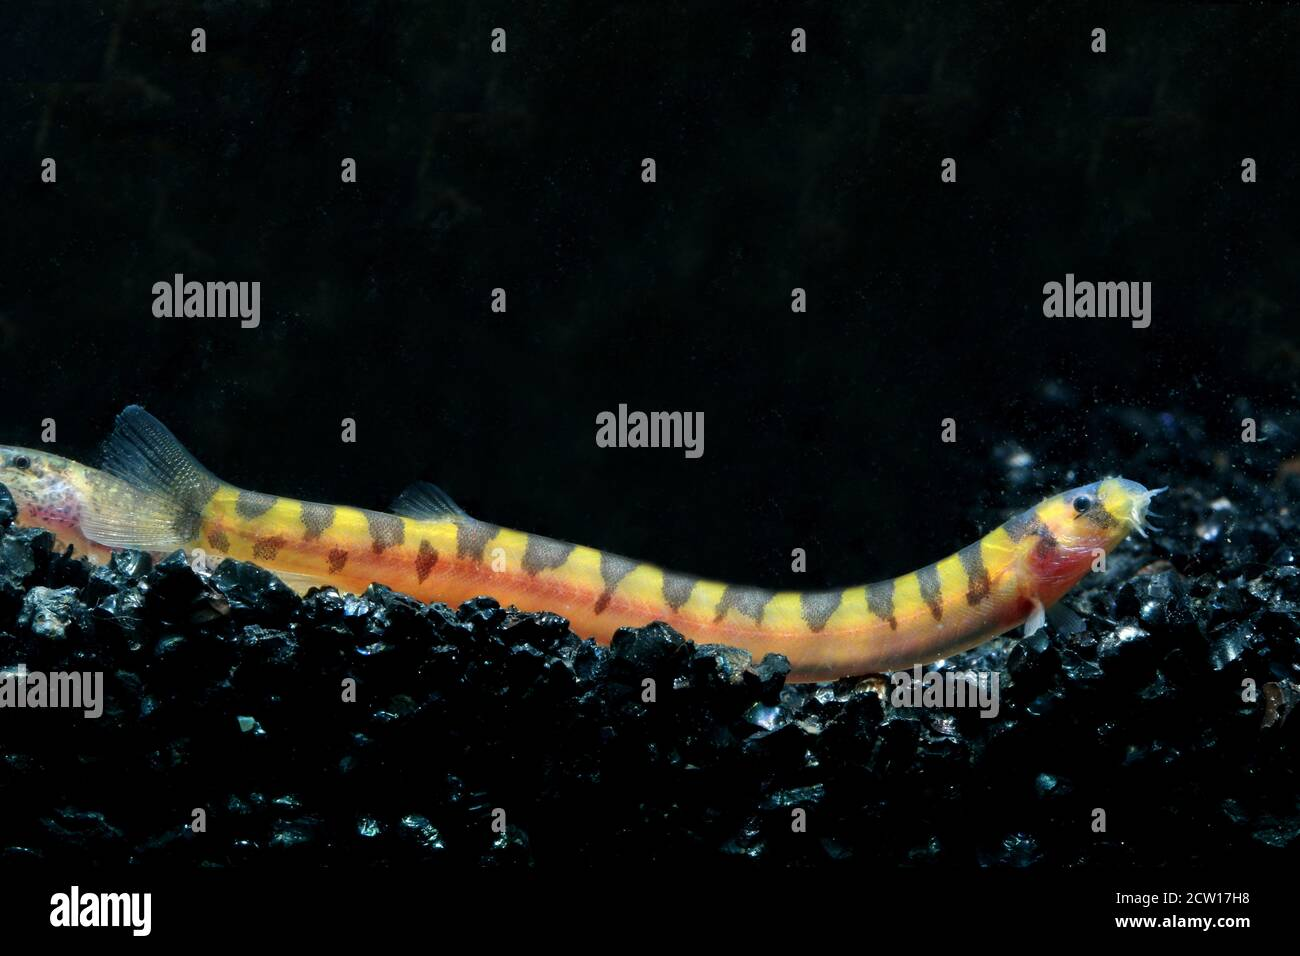 Pangio malayana o Malayan Pangio, Acanthophthalmus kuhlii malayanus Foto de stock